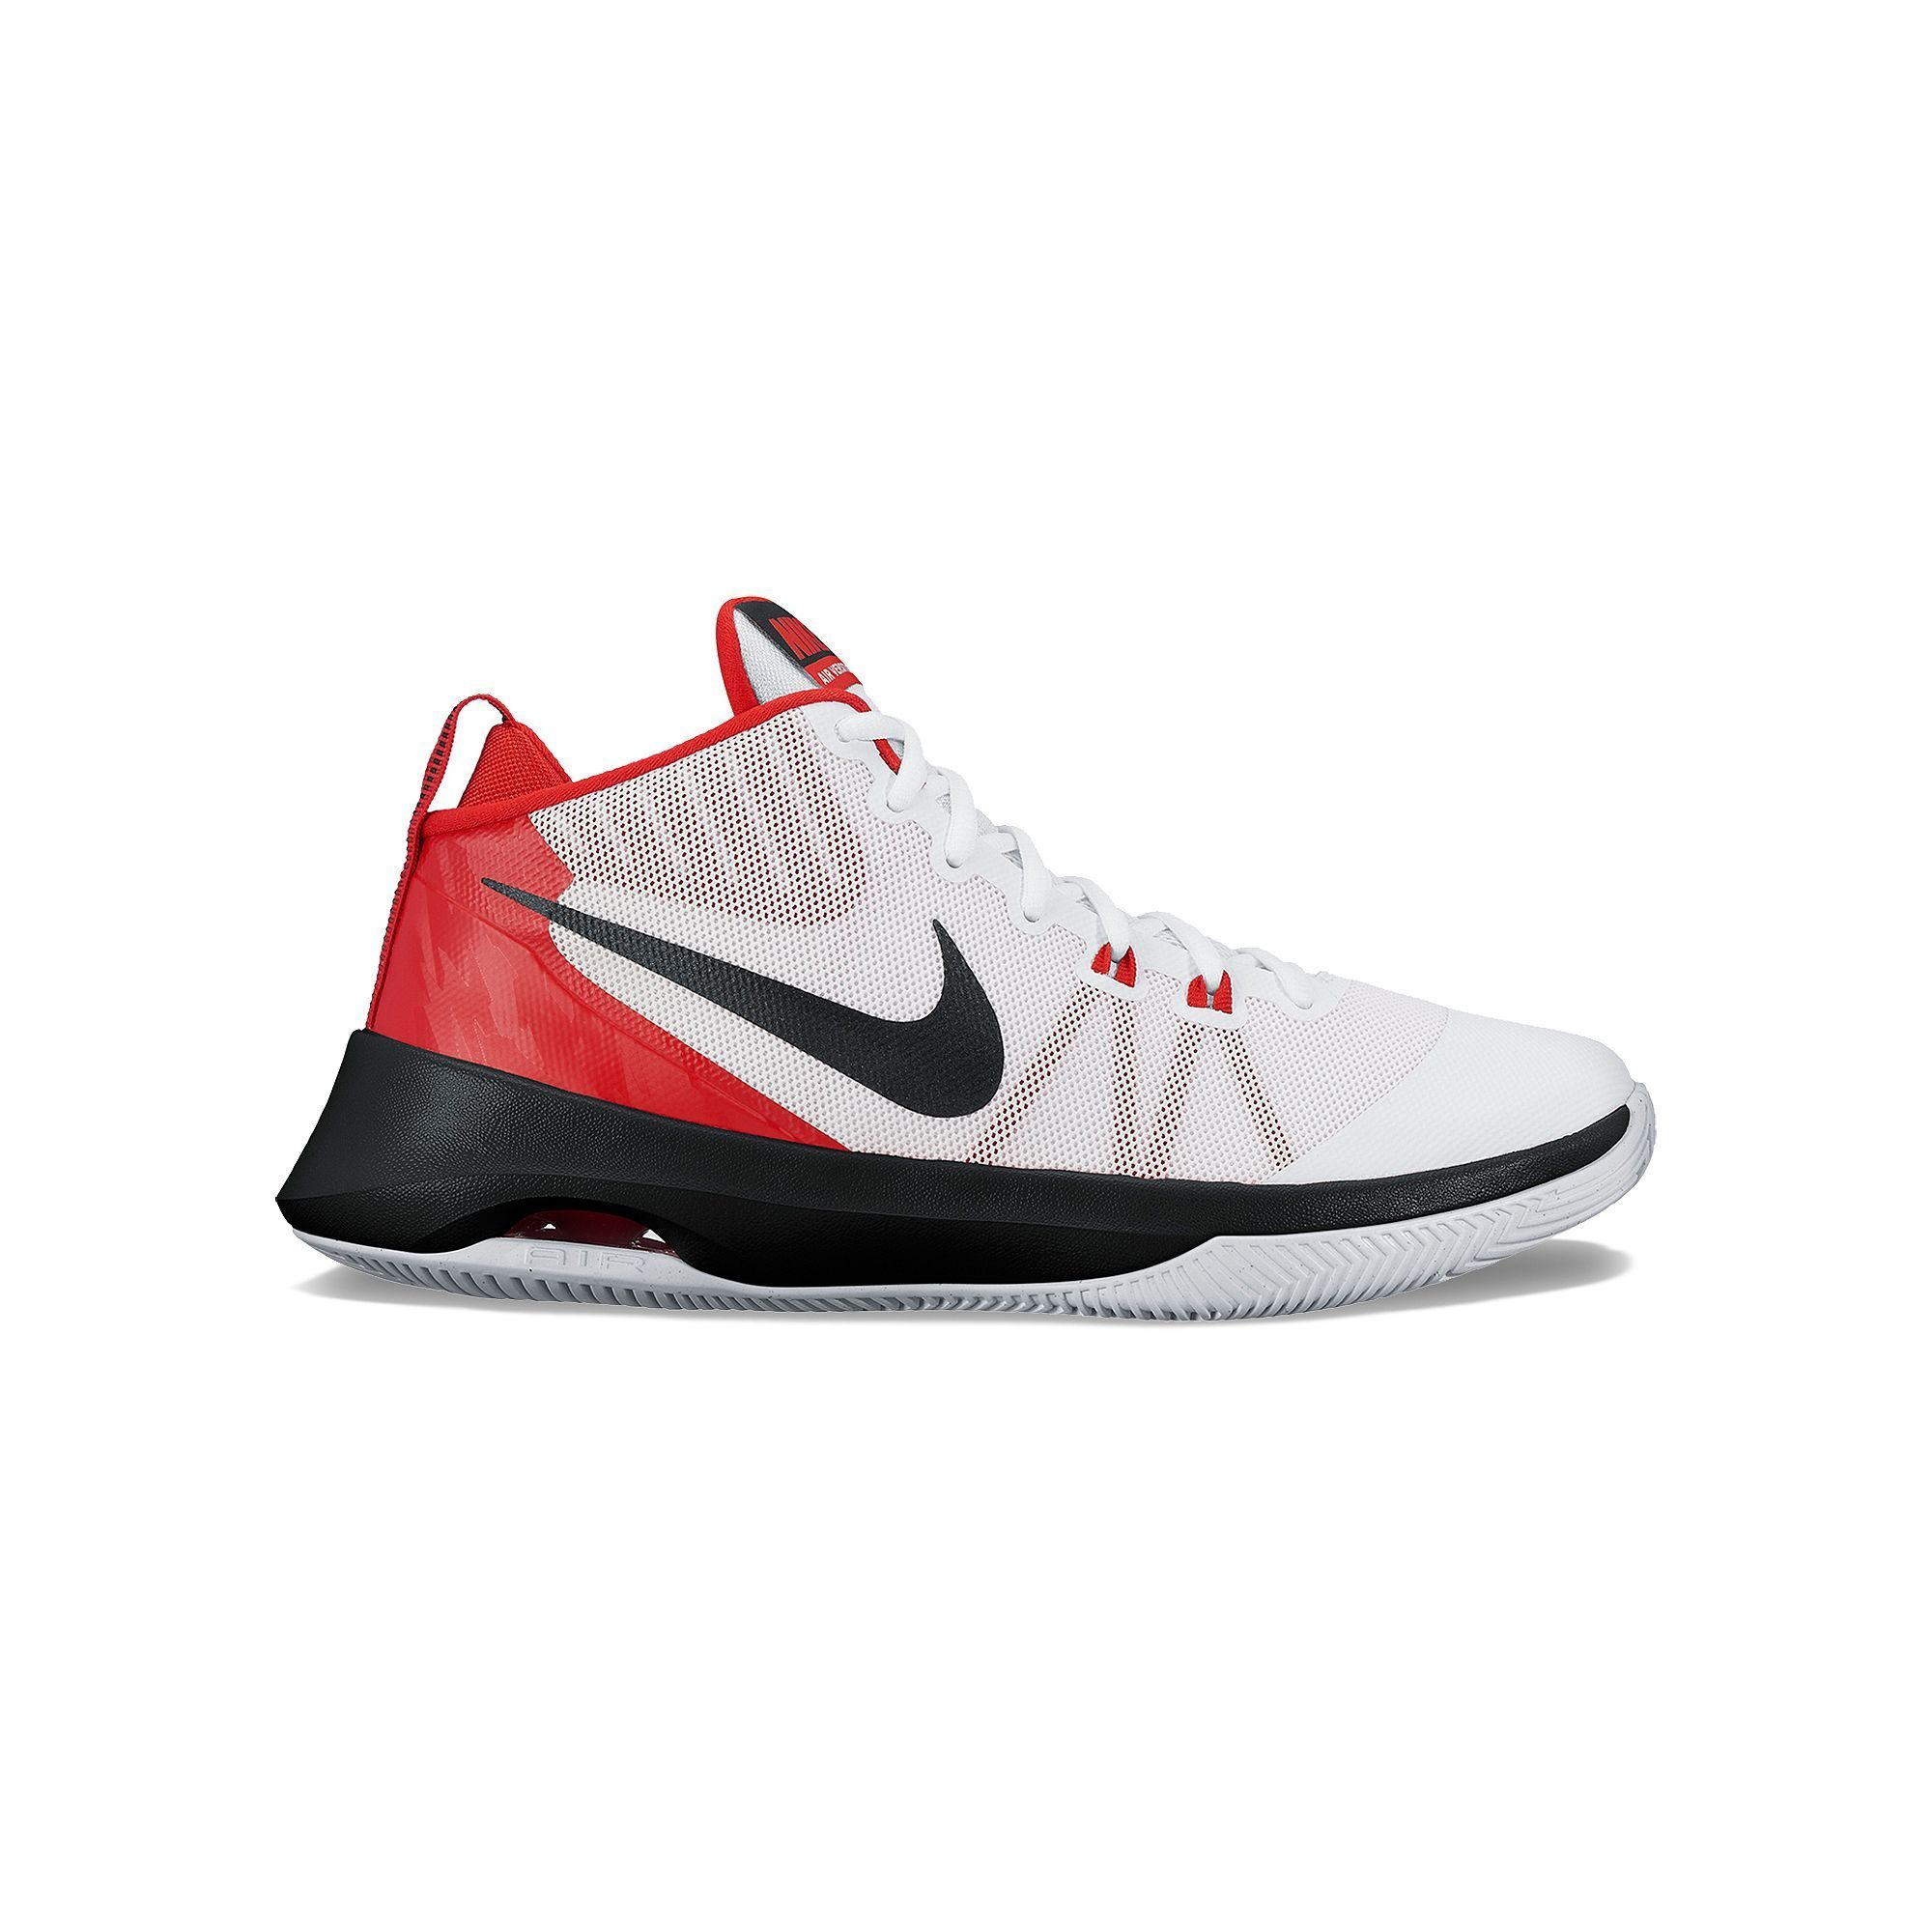 sale retailer 5b981 92808 Nike Air Versitile Men's Basketball Shoes | Products